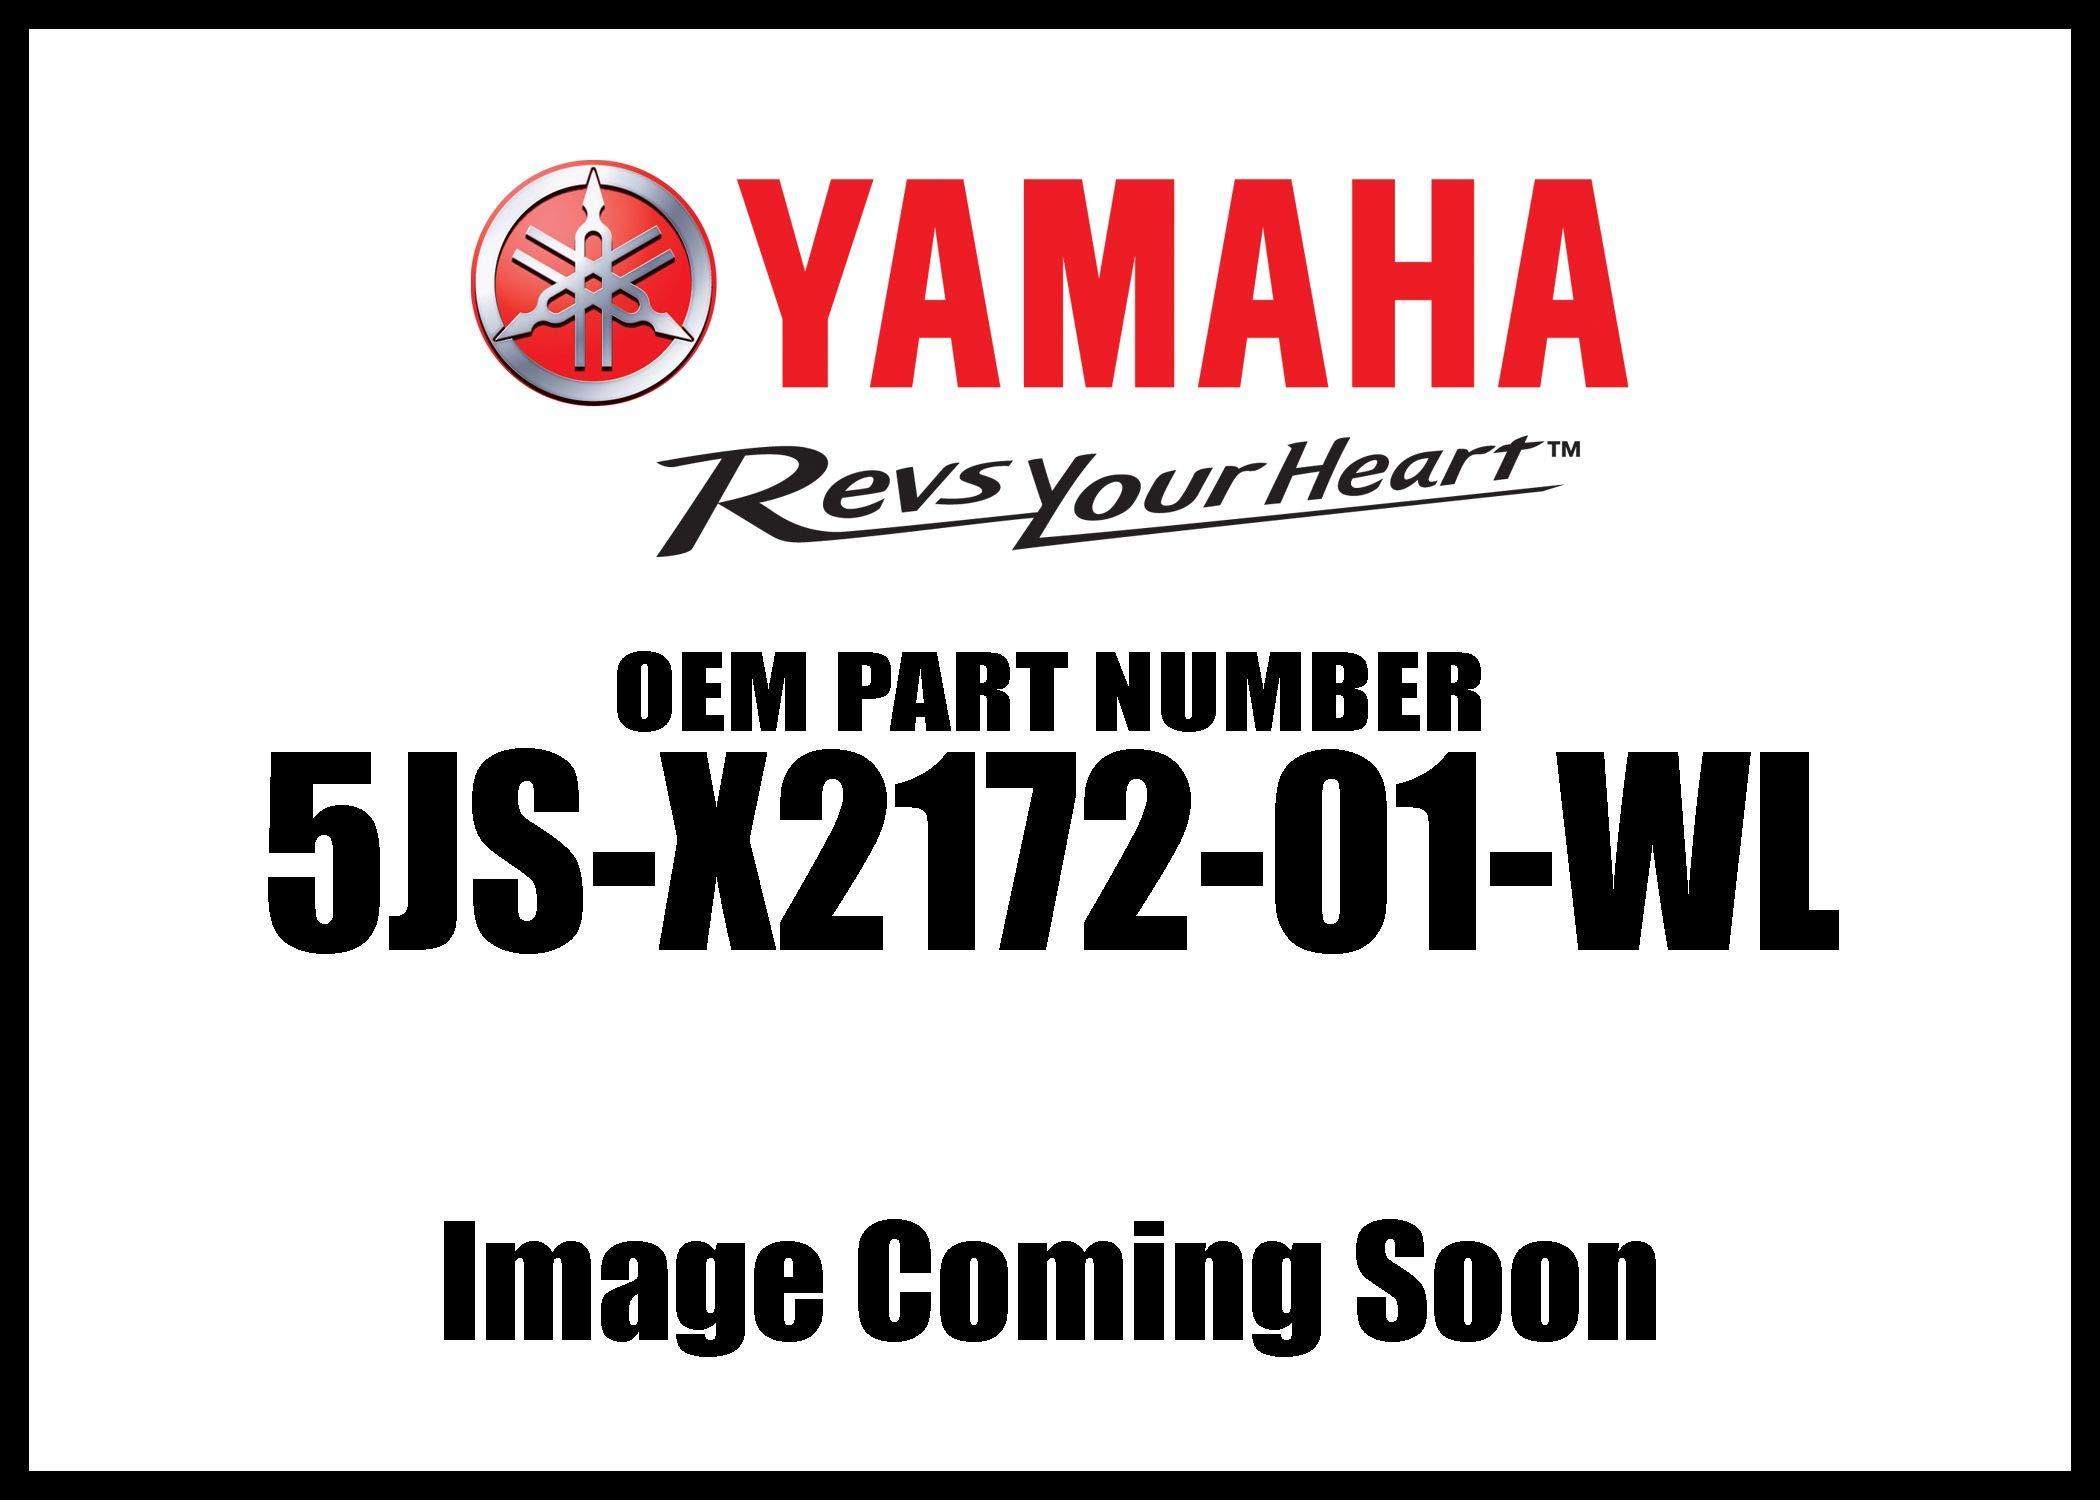 New Yamaha OEM 5JS-X2172-01-WL COVER, SIDE 2 5JSX217201WL